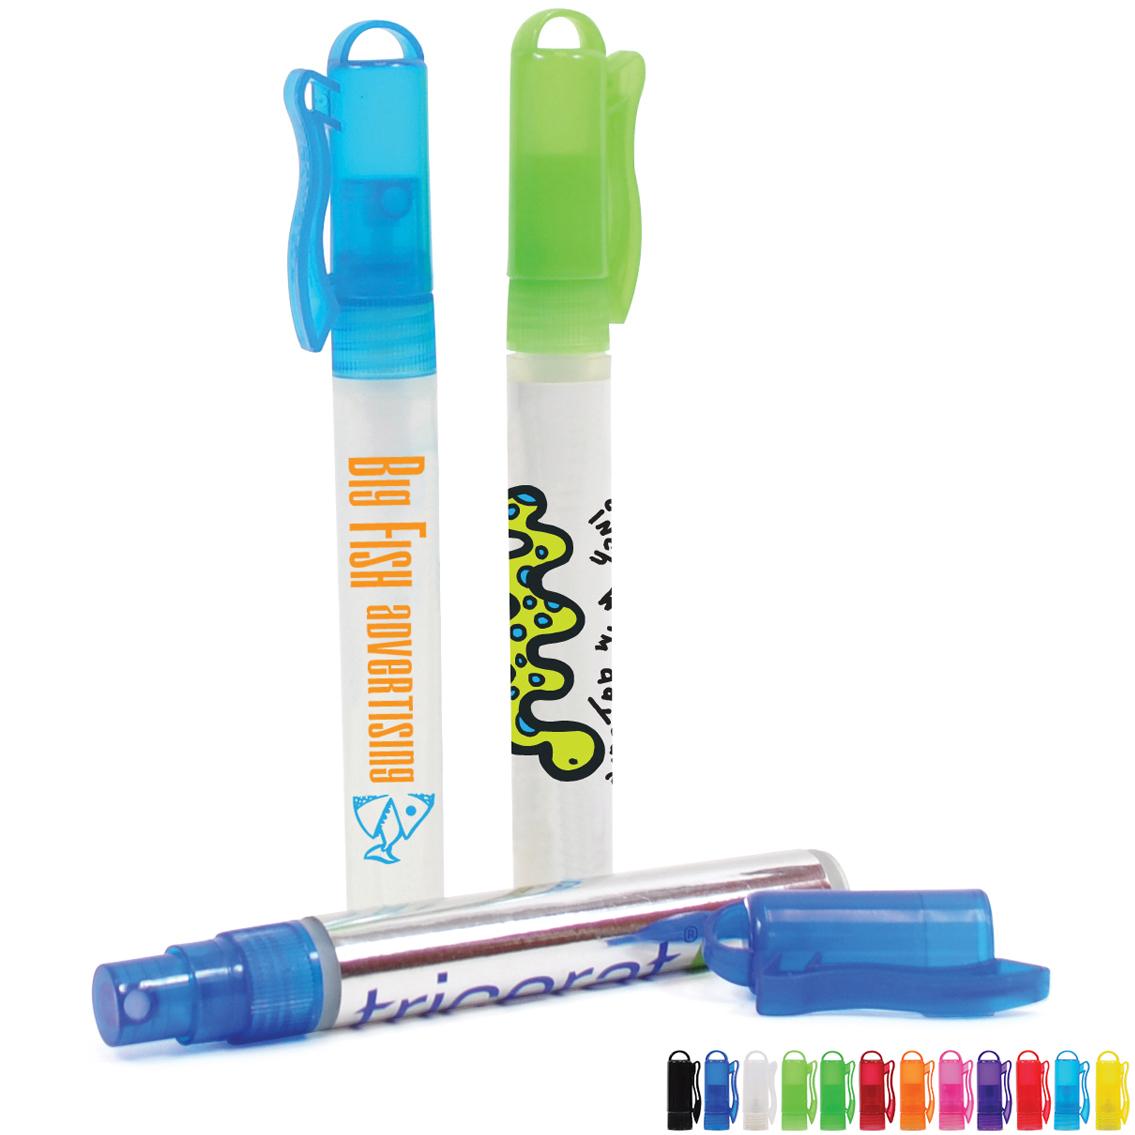 Color Pop Antibacterial Hand Sanitizer Spray, 10ml, Full Color Imprint